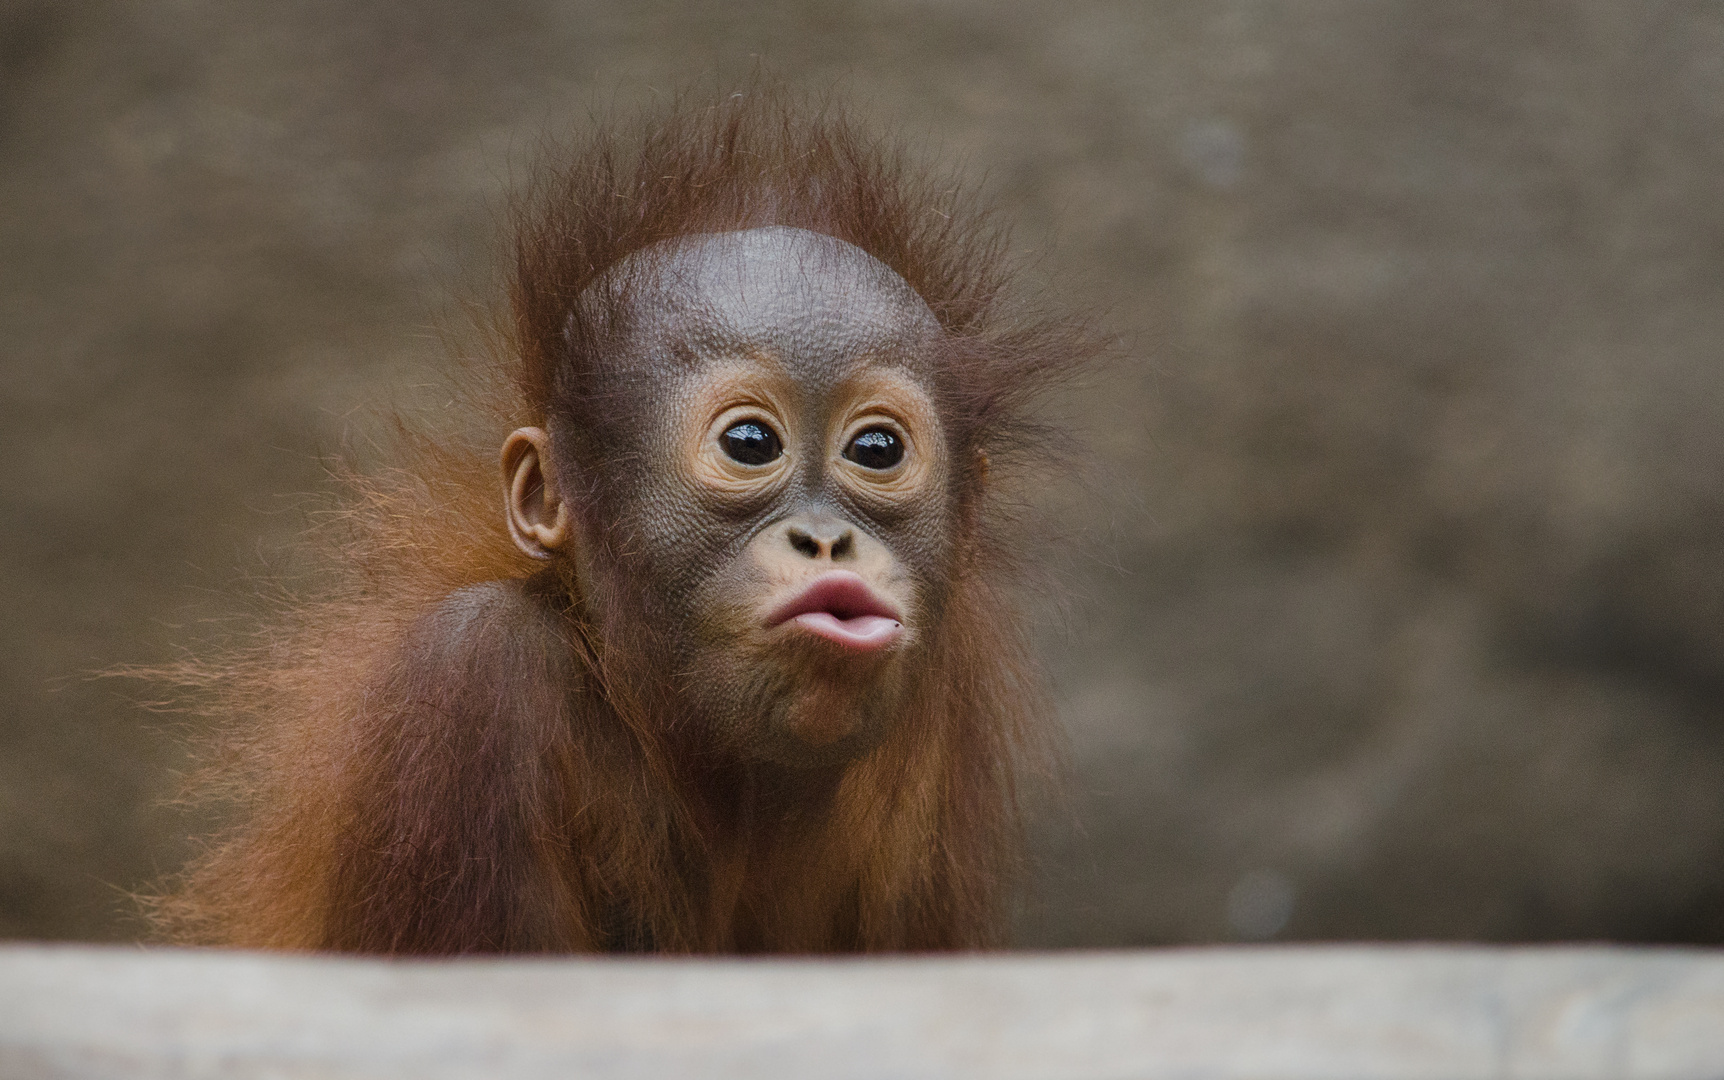 Kusschen Foto Bild Tiere Tierkinder Orang Utan Baby Bilder